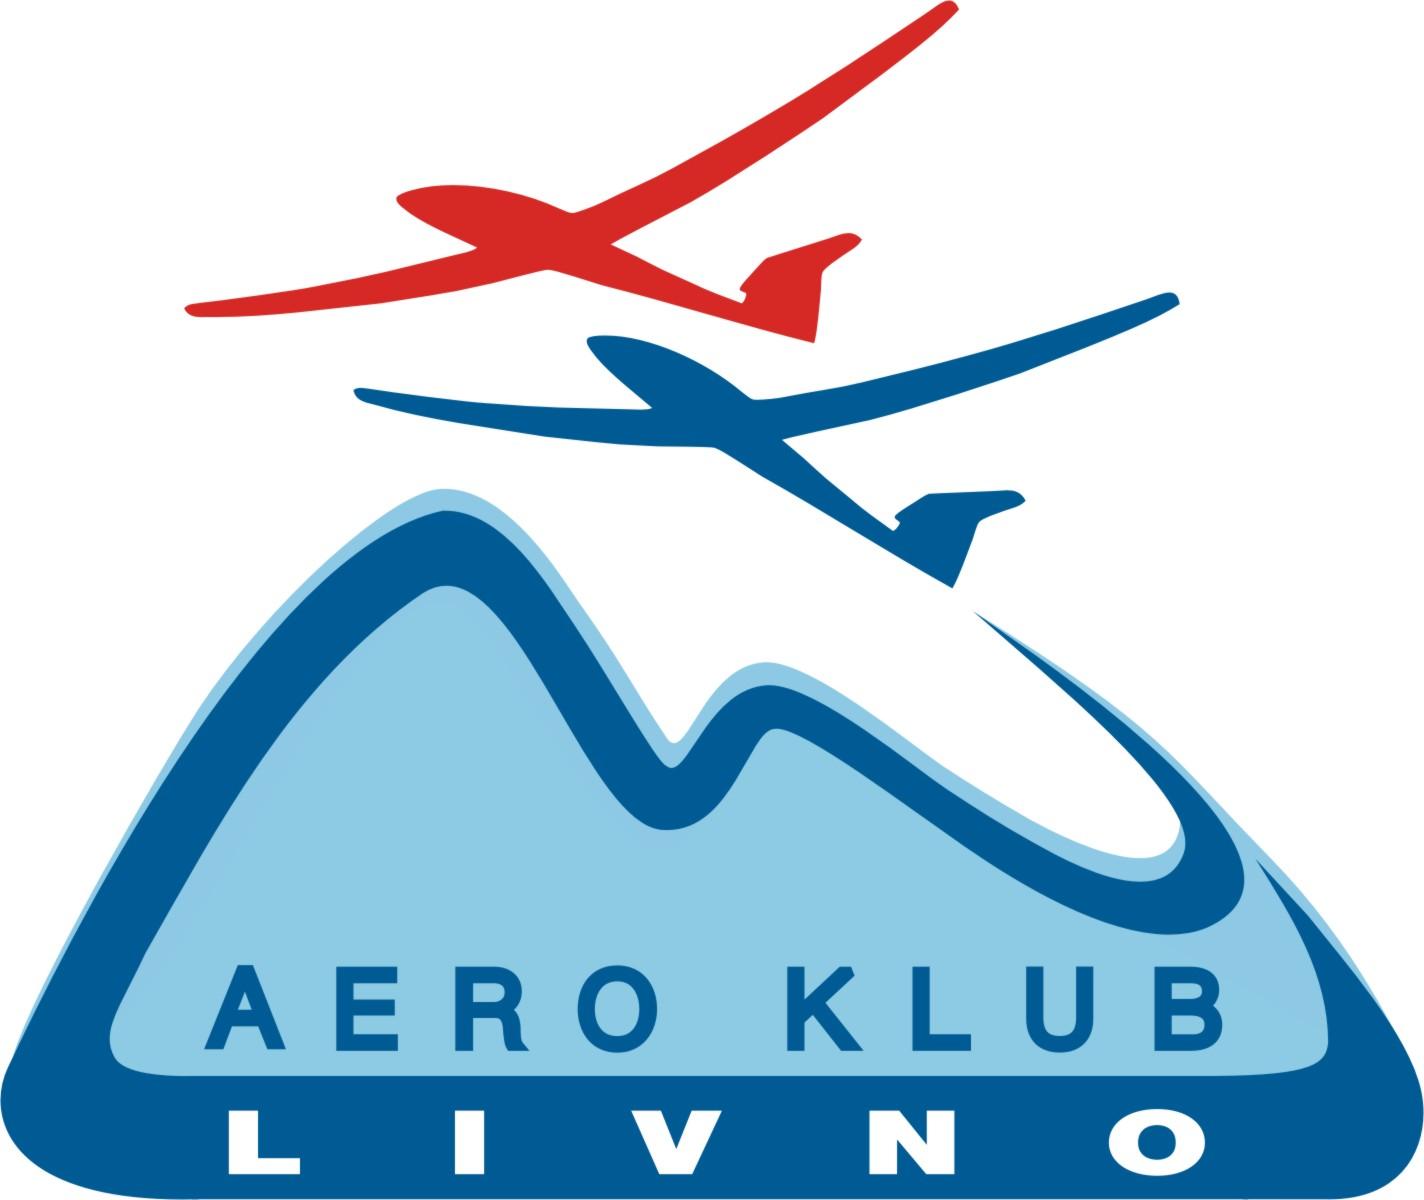 Aeroklub Livno.